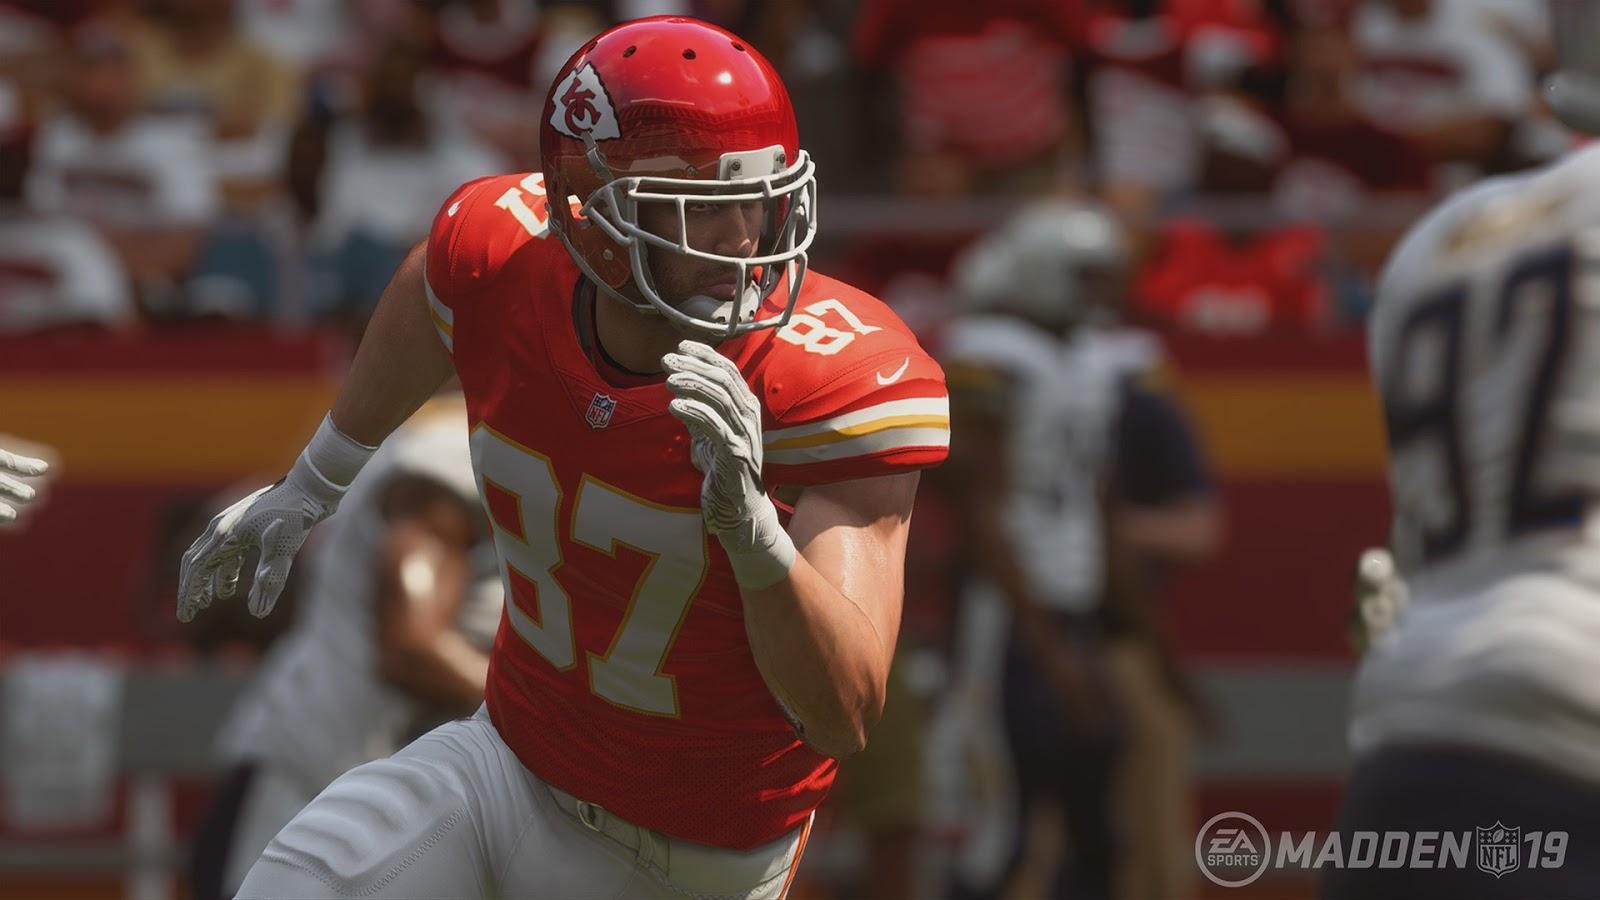 Madden NFL 19 PC (CODEX) 9